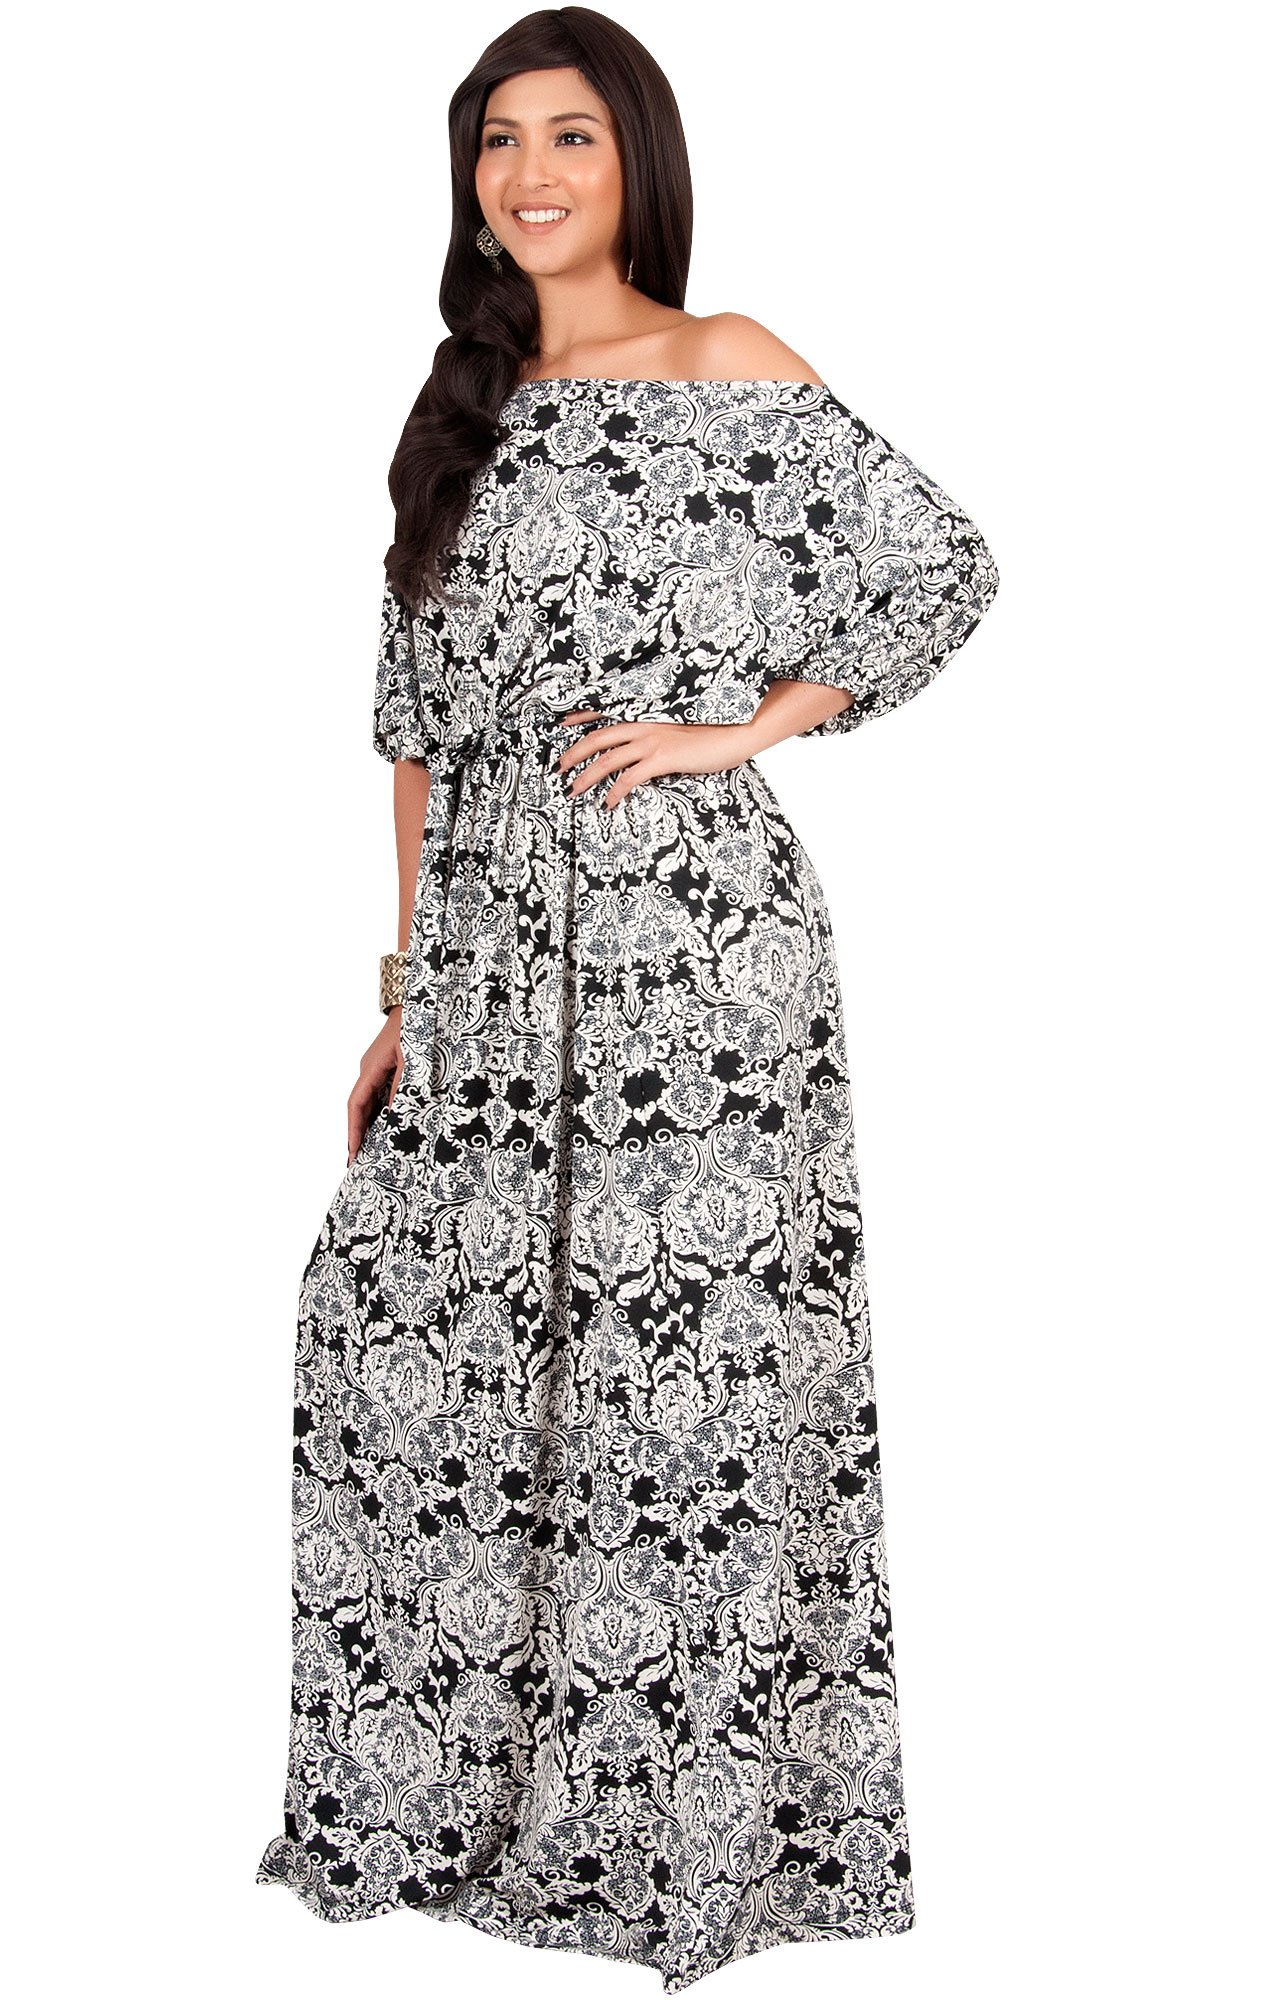 e8ef2057dafd ... One Off Shoulder Print Casual Flowy 3 4 Short Sleeve Summer Cute Boho  Bohemian Sexy Gown Gowns Maxi Dress Dresses